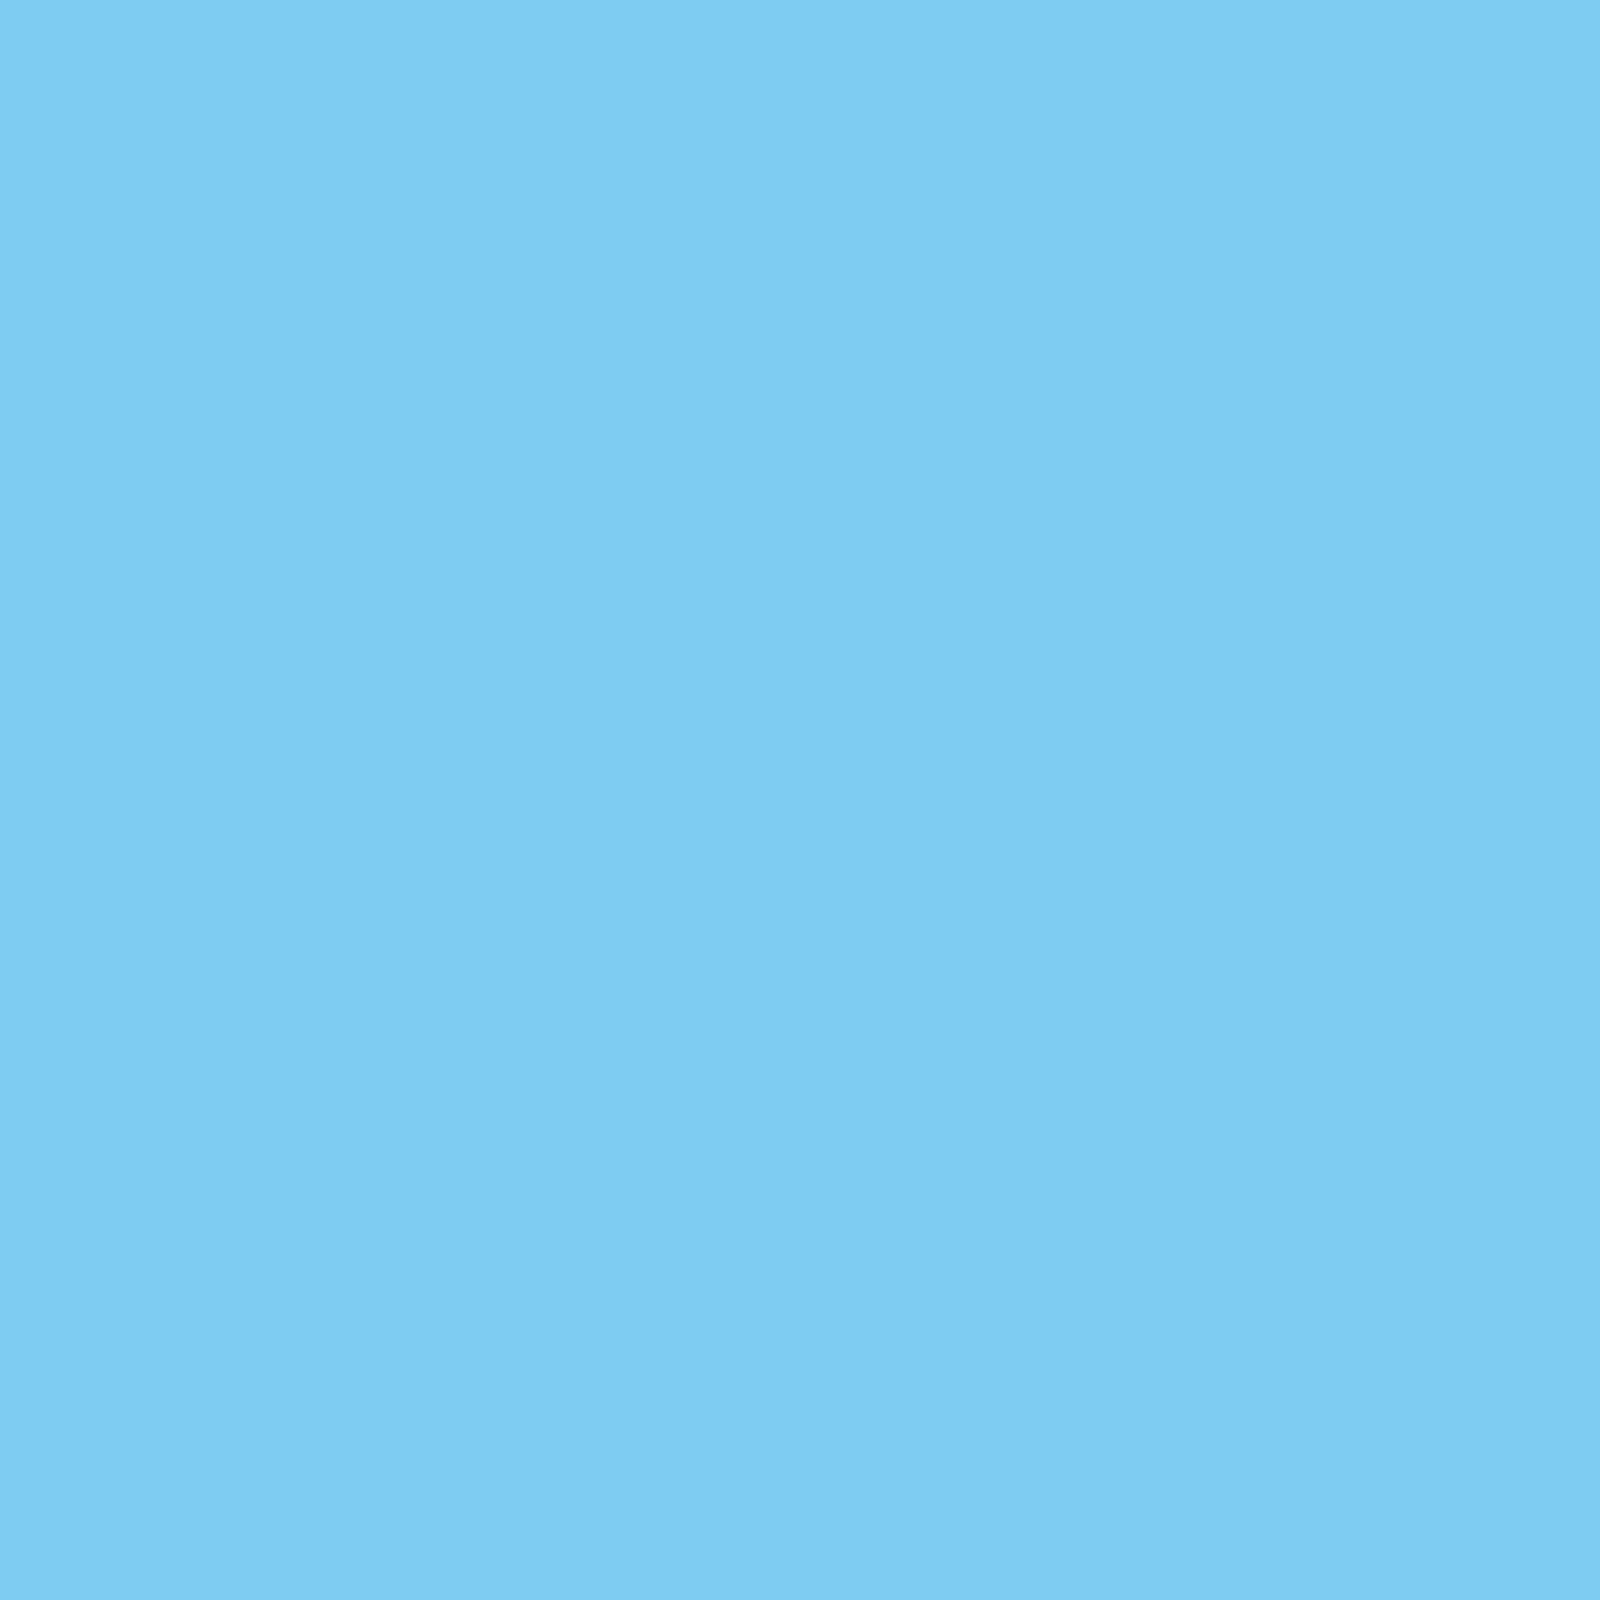 albastru pastel